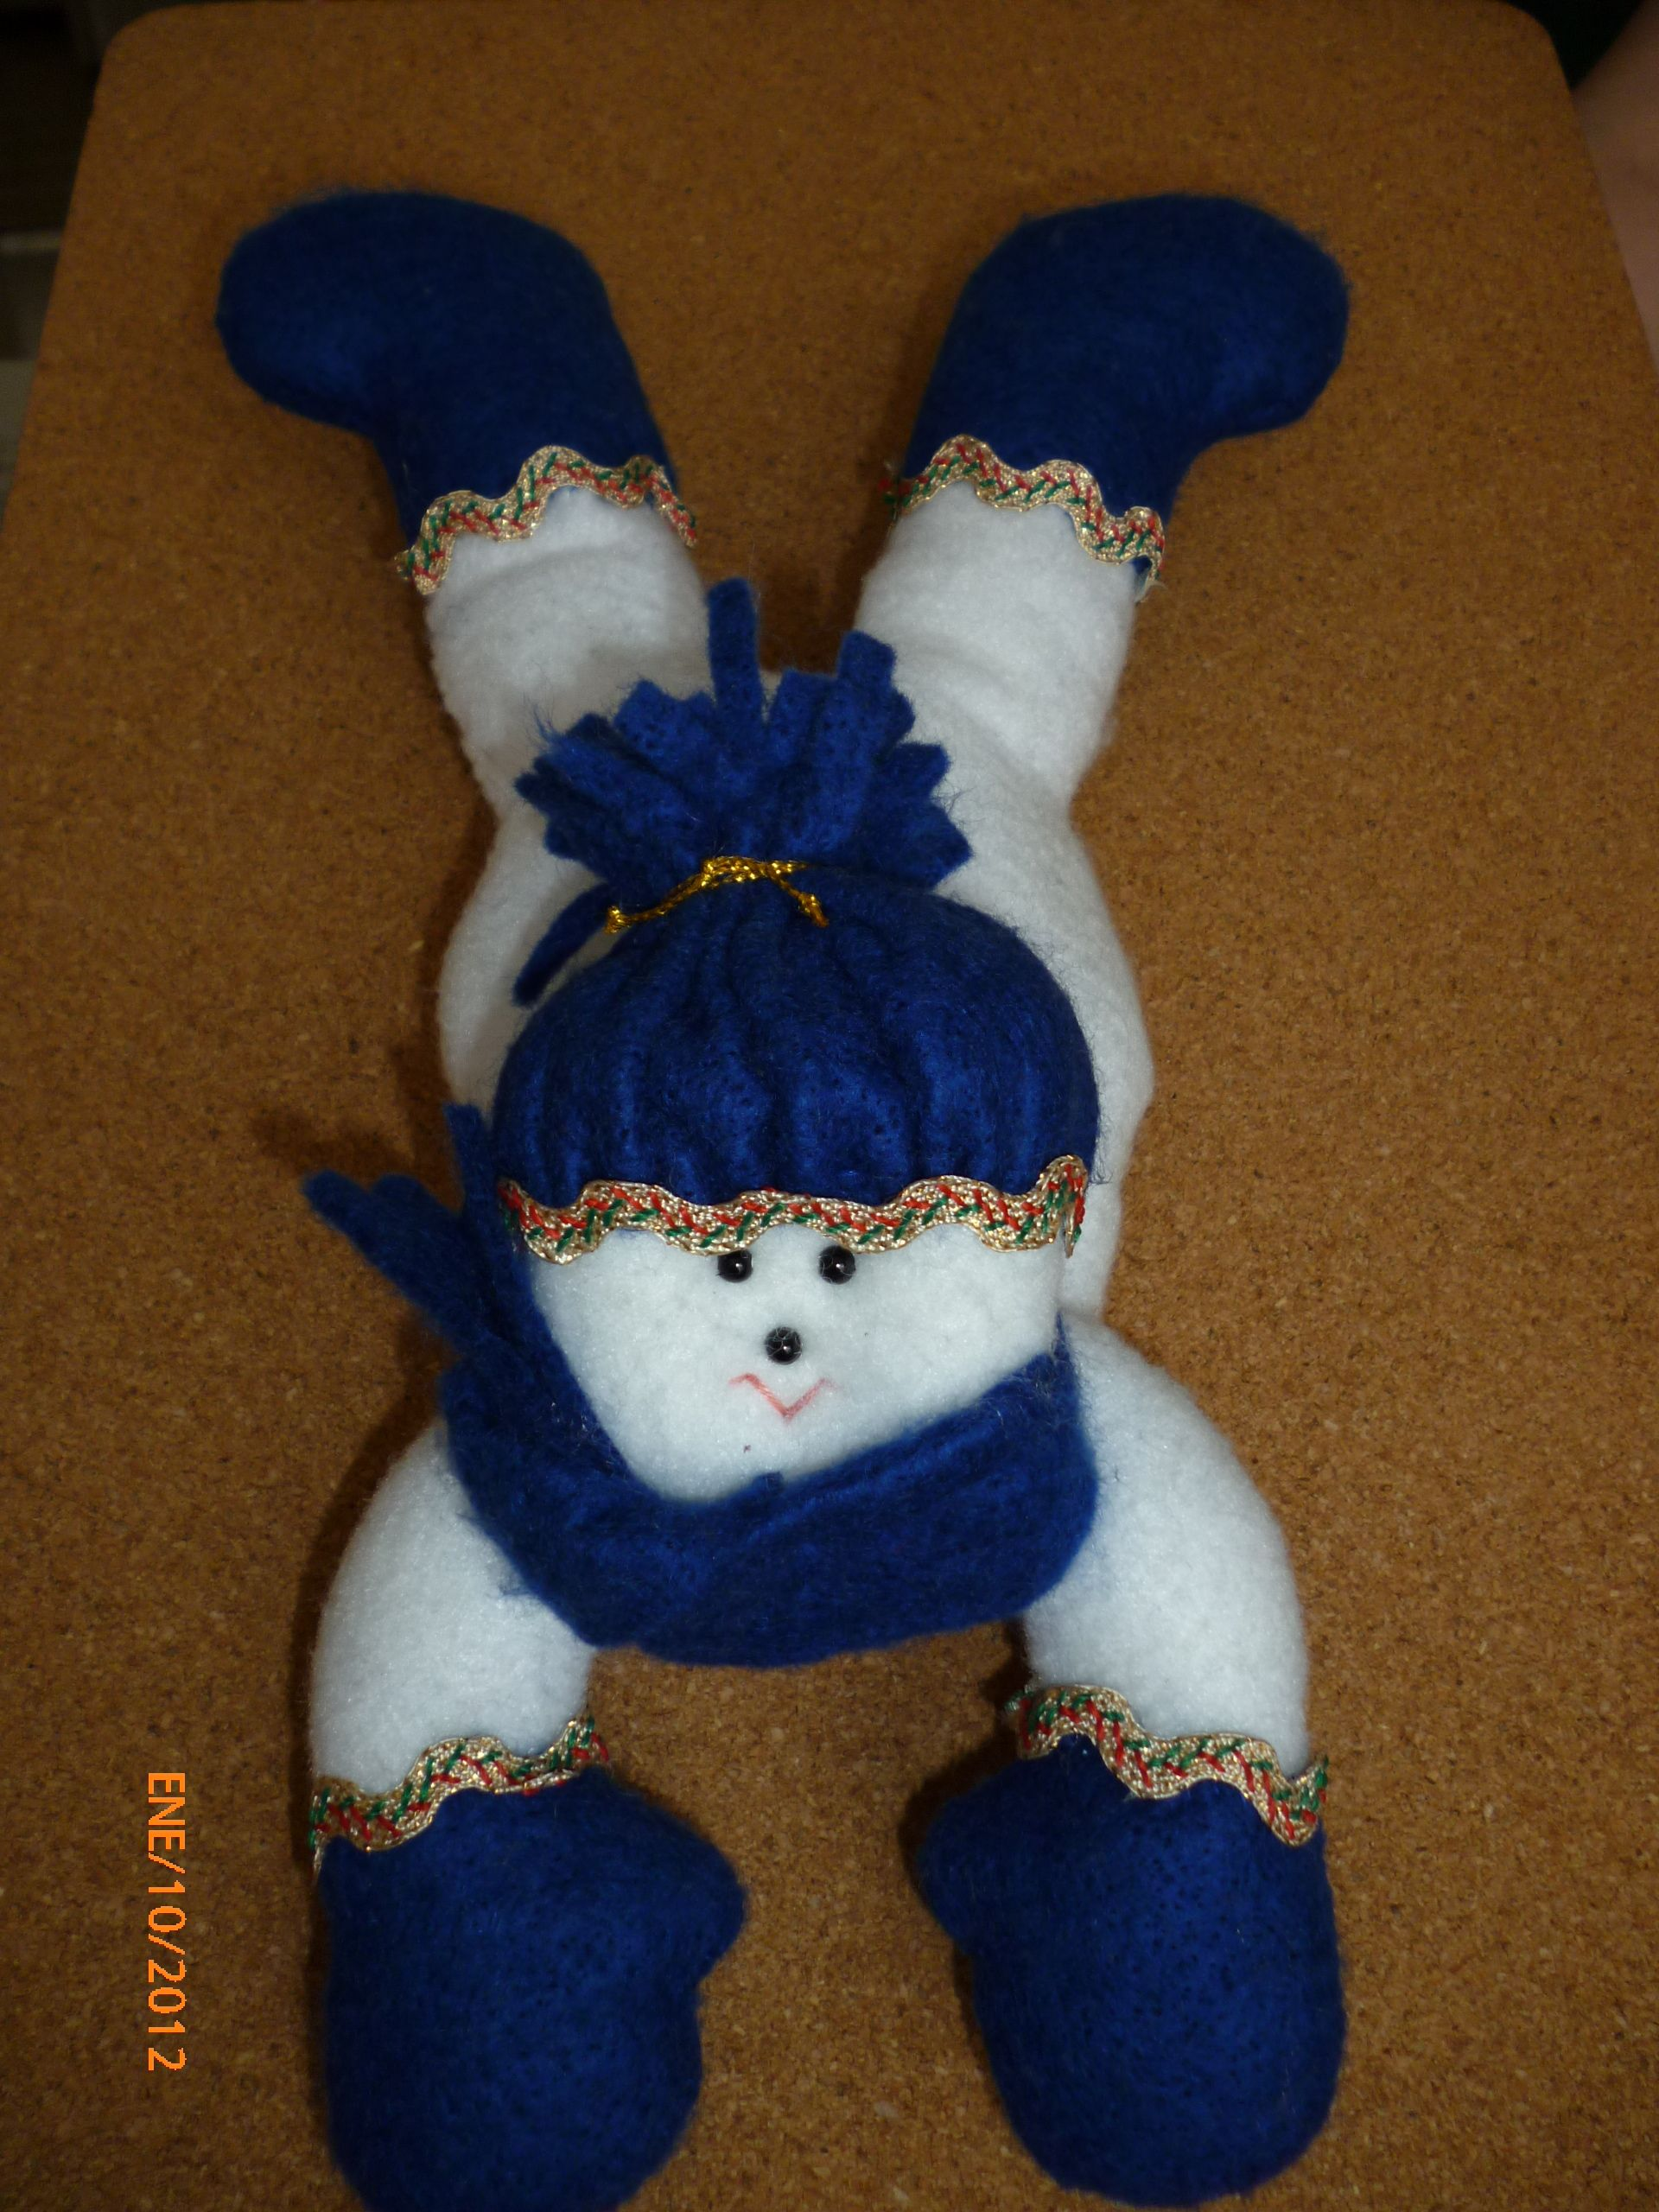 Muñeco de nieve acostado. | paño lency | Pinterest | Nieve, Muñecos ...